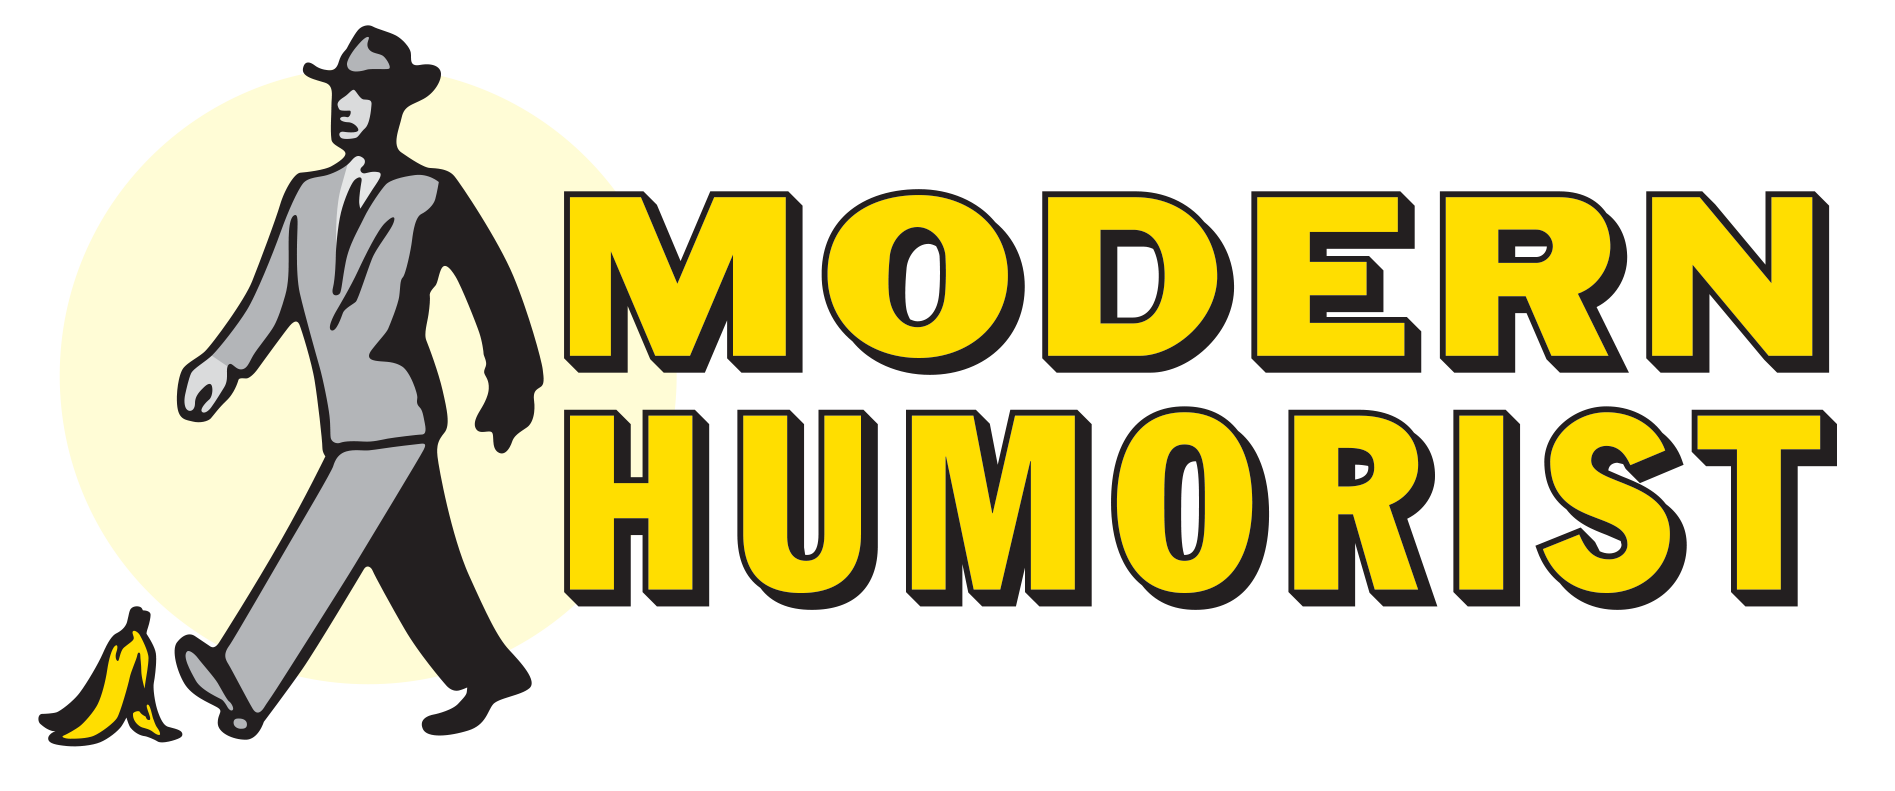 Modern Humorist logo